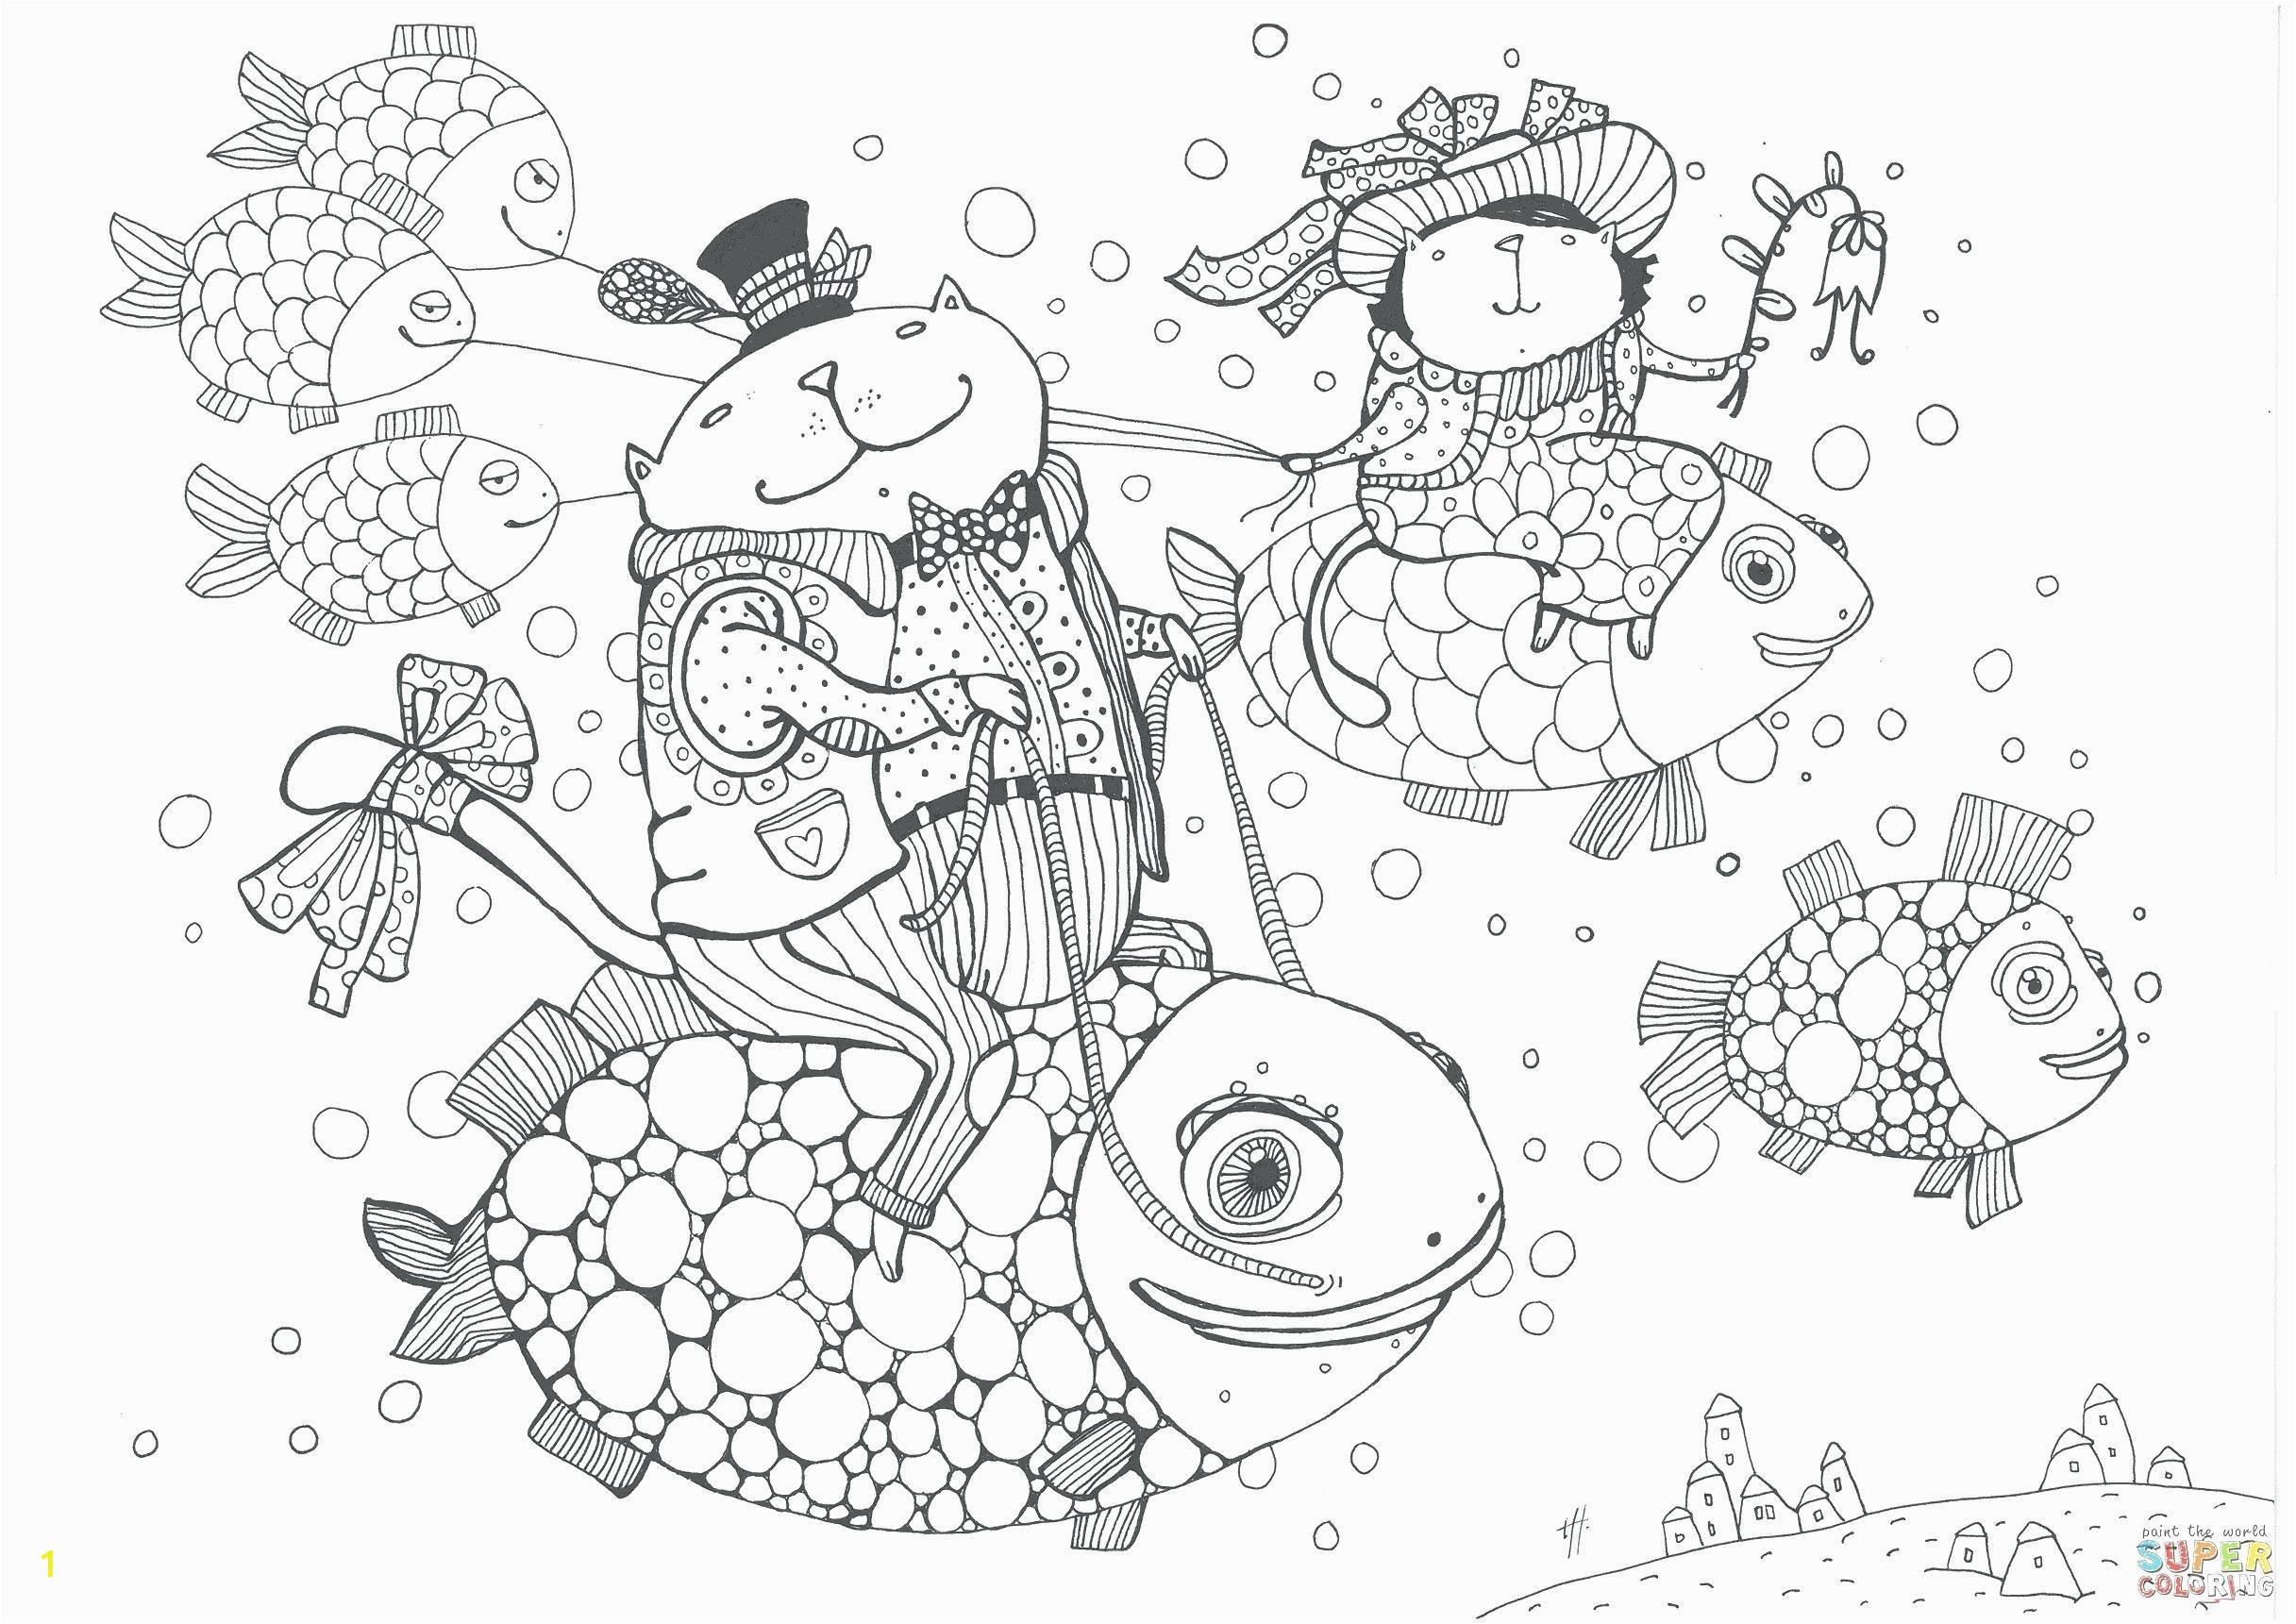 coloring pages pre school navajosheet co preschool sheets free summer bird printable fall tree k prekindergarten programs montessori schools with kinder near me for